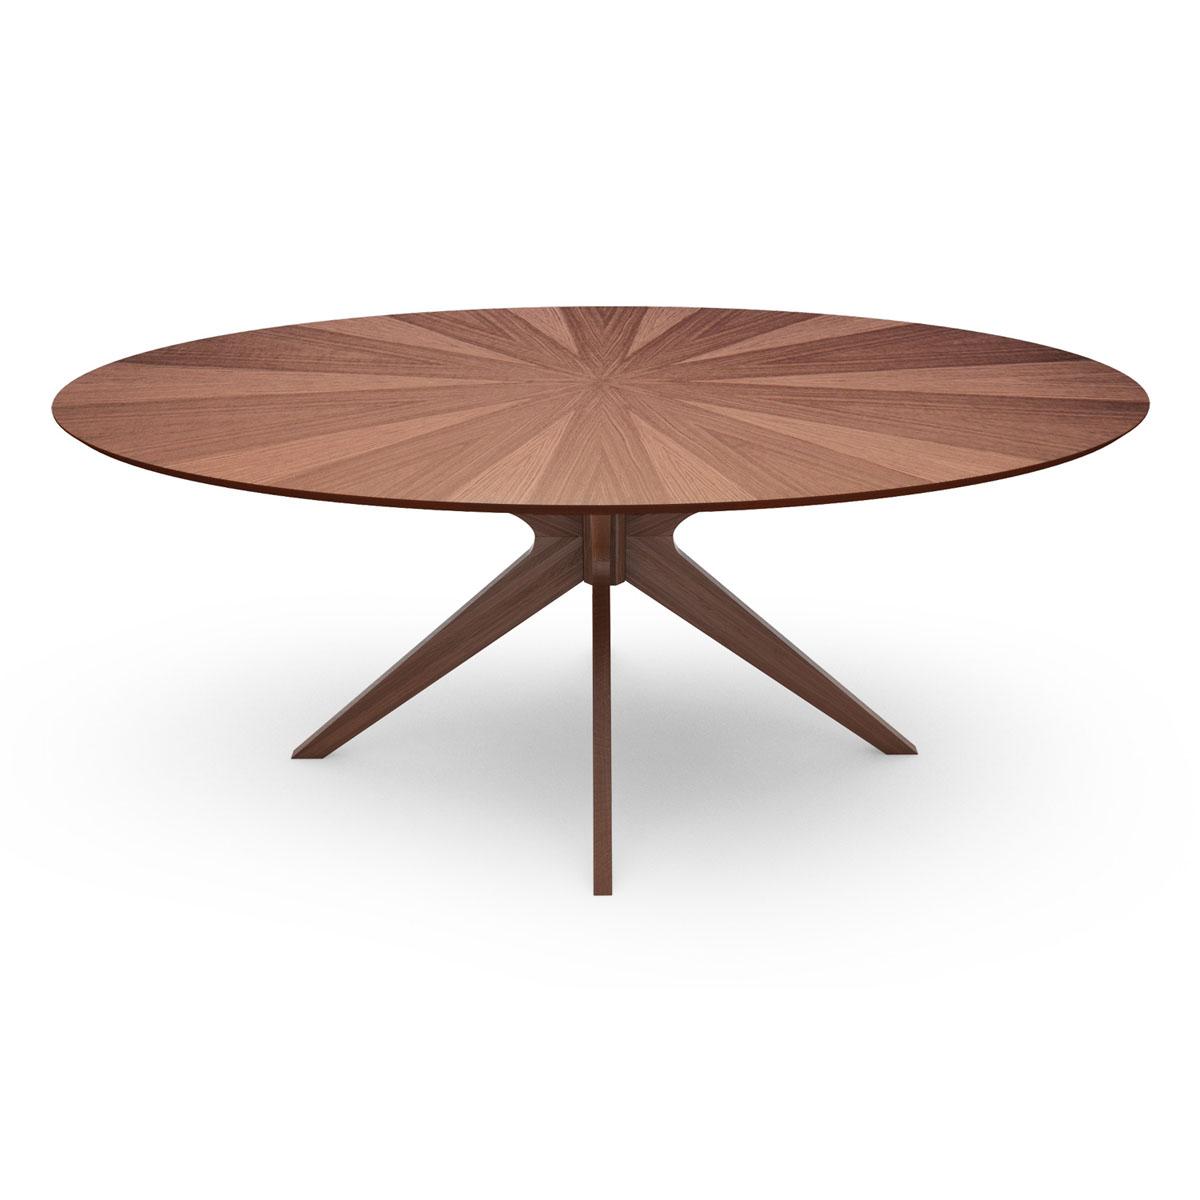 Starburst Oval Dining Table. U003e